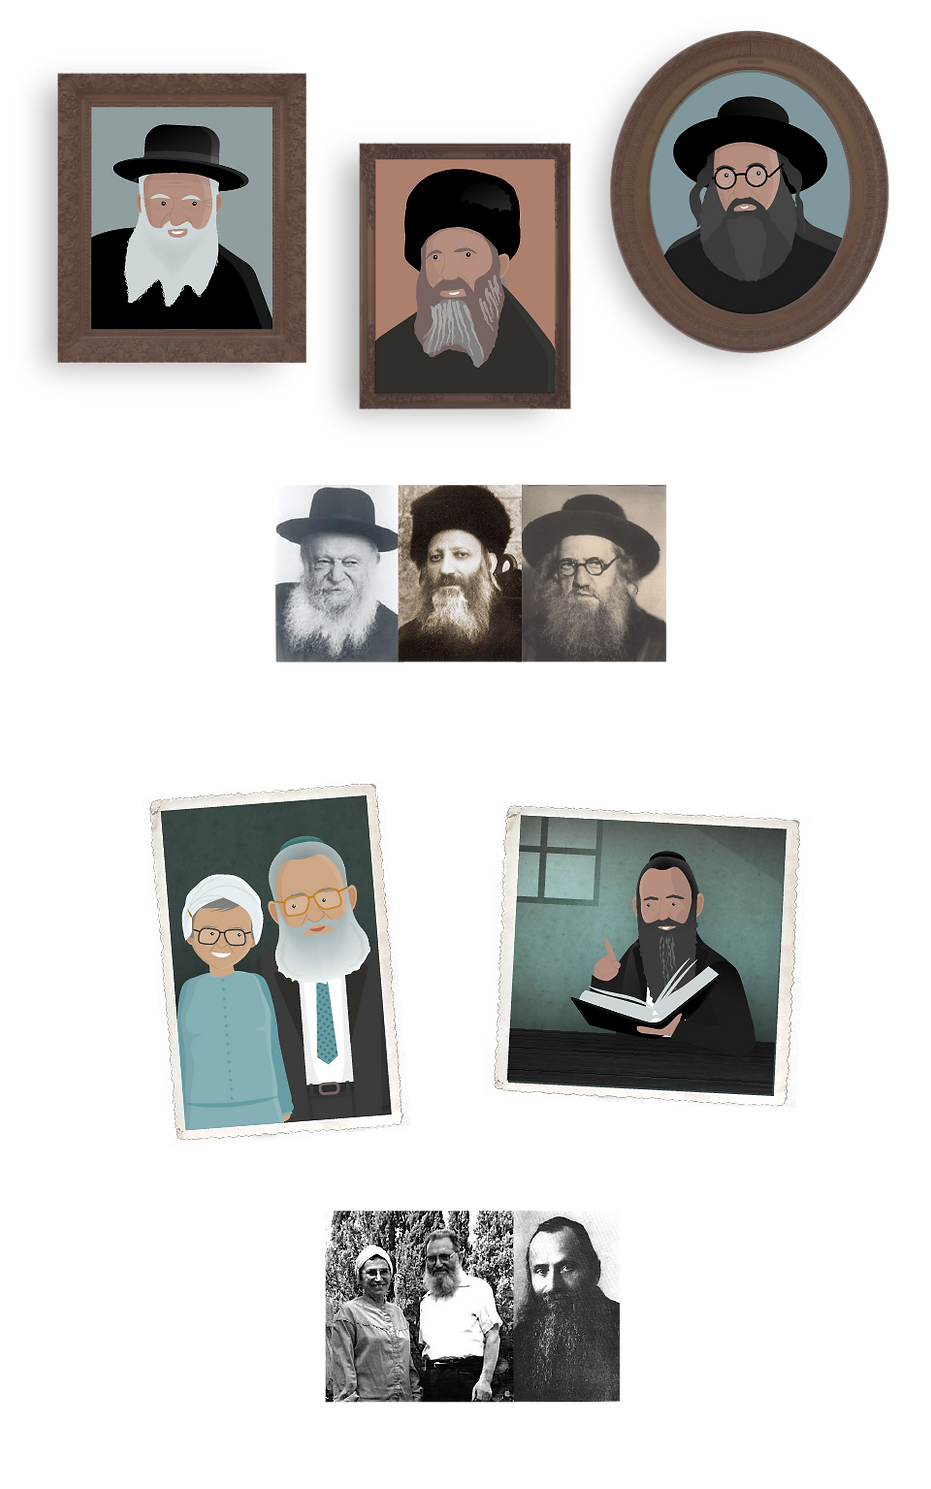 Portraits of rabbis